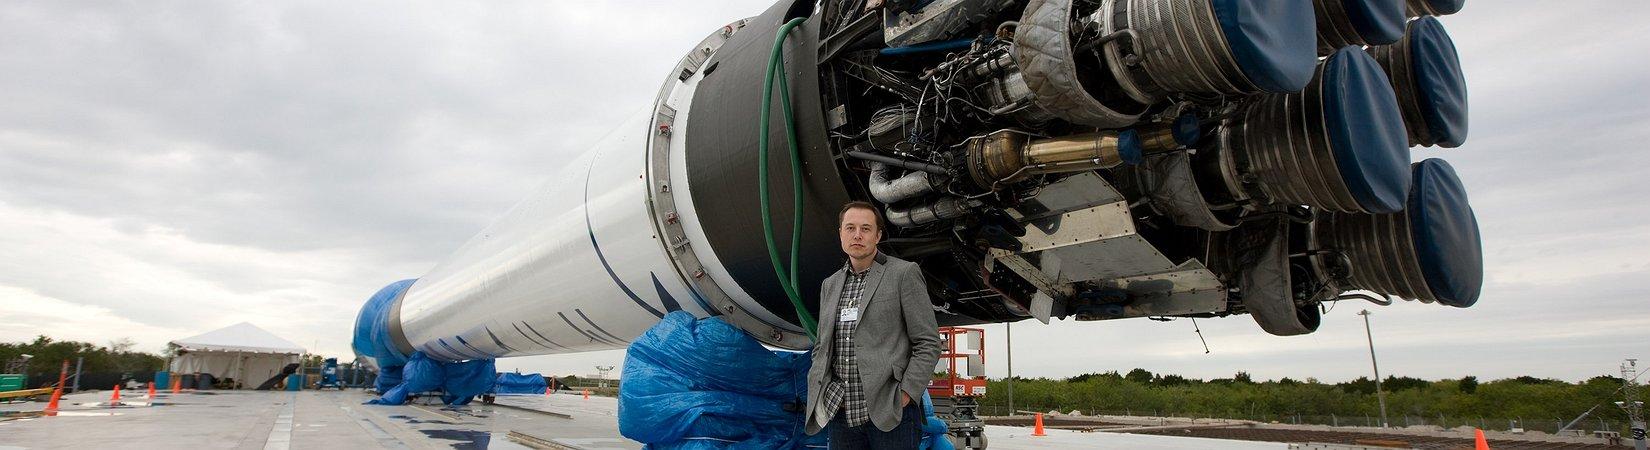 Elon Musk svela la tuta spaziale di SpaceX